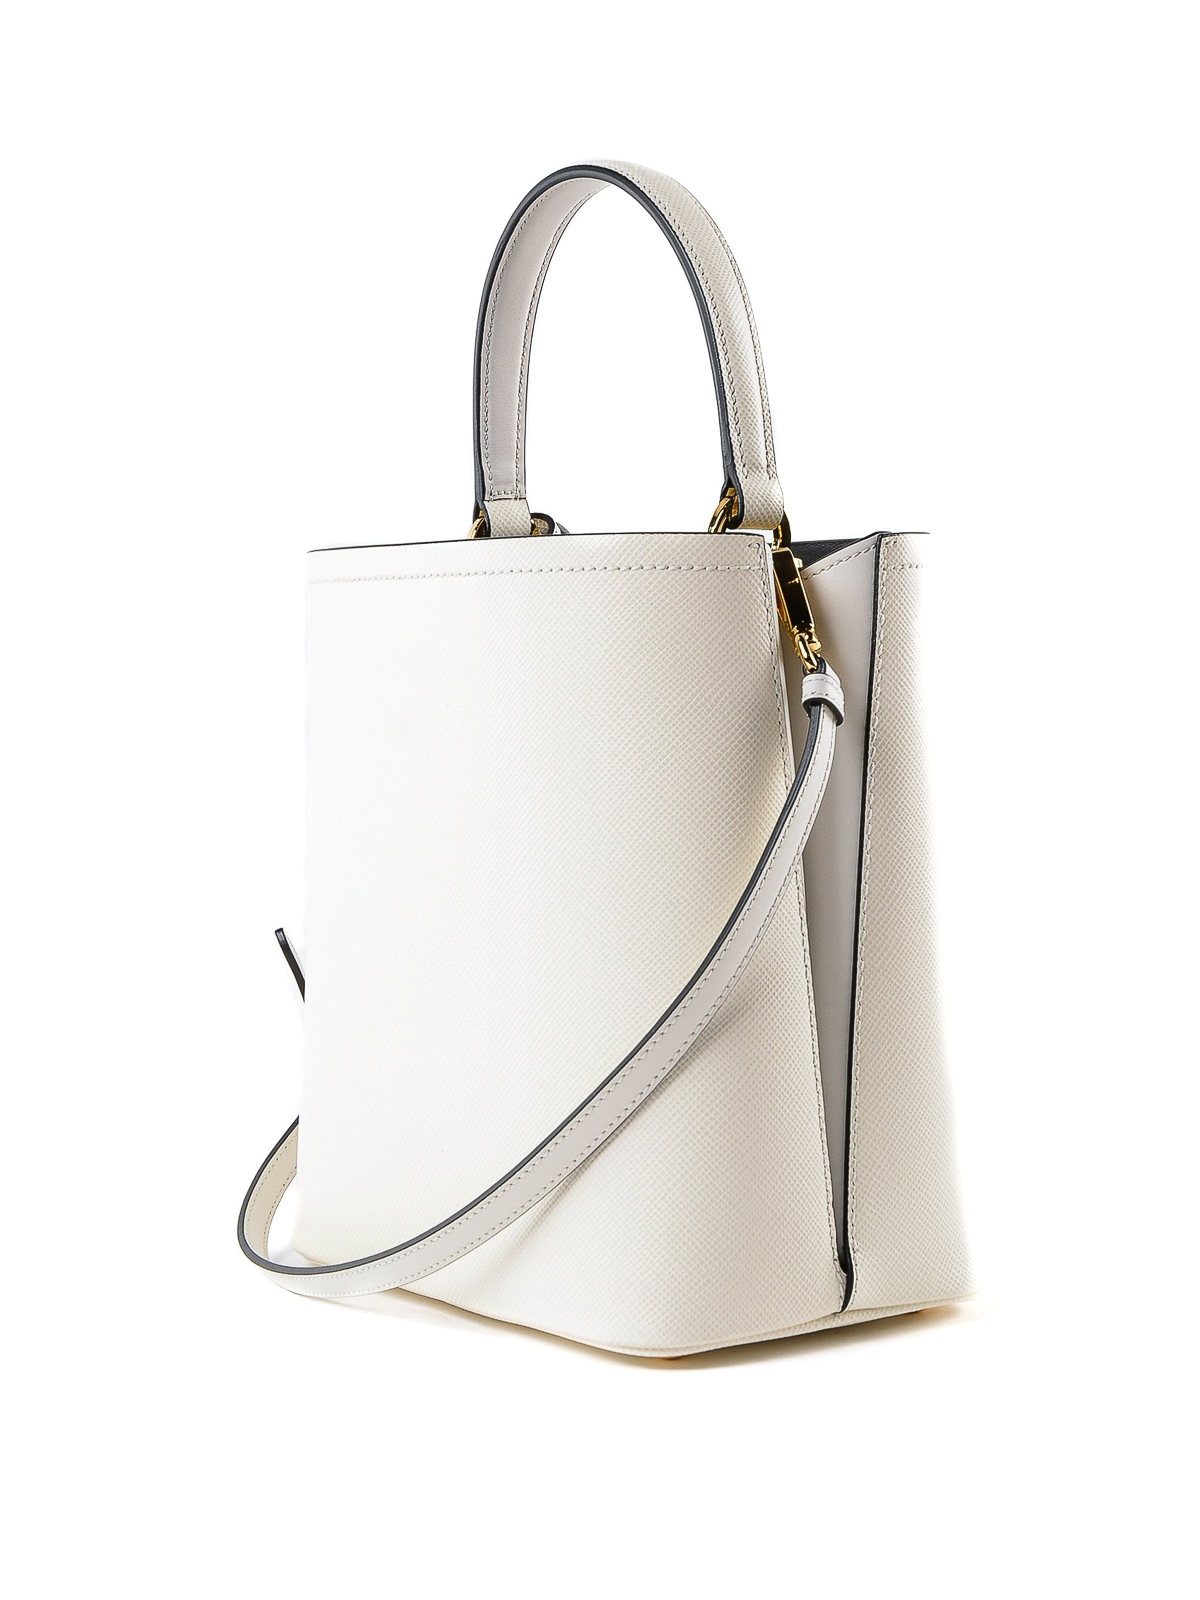 cb4920a38d4b iKRIX PRADA  Bucket bags - White Saffiano leather double bucket bag